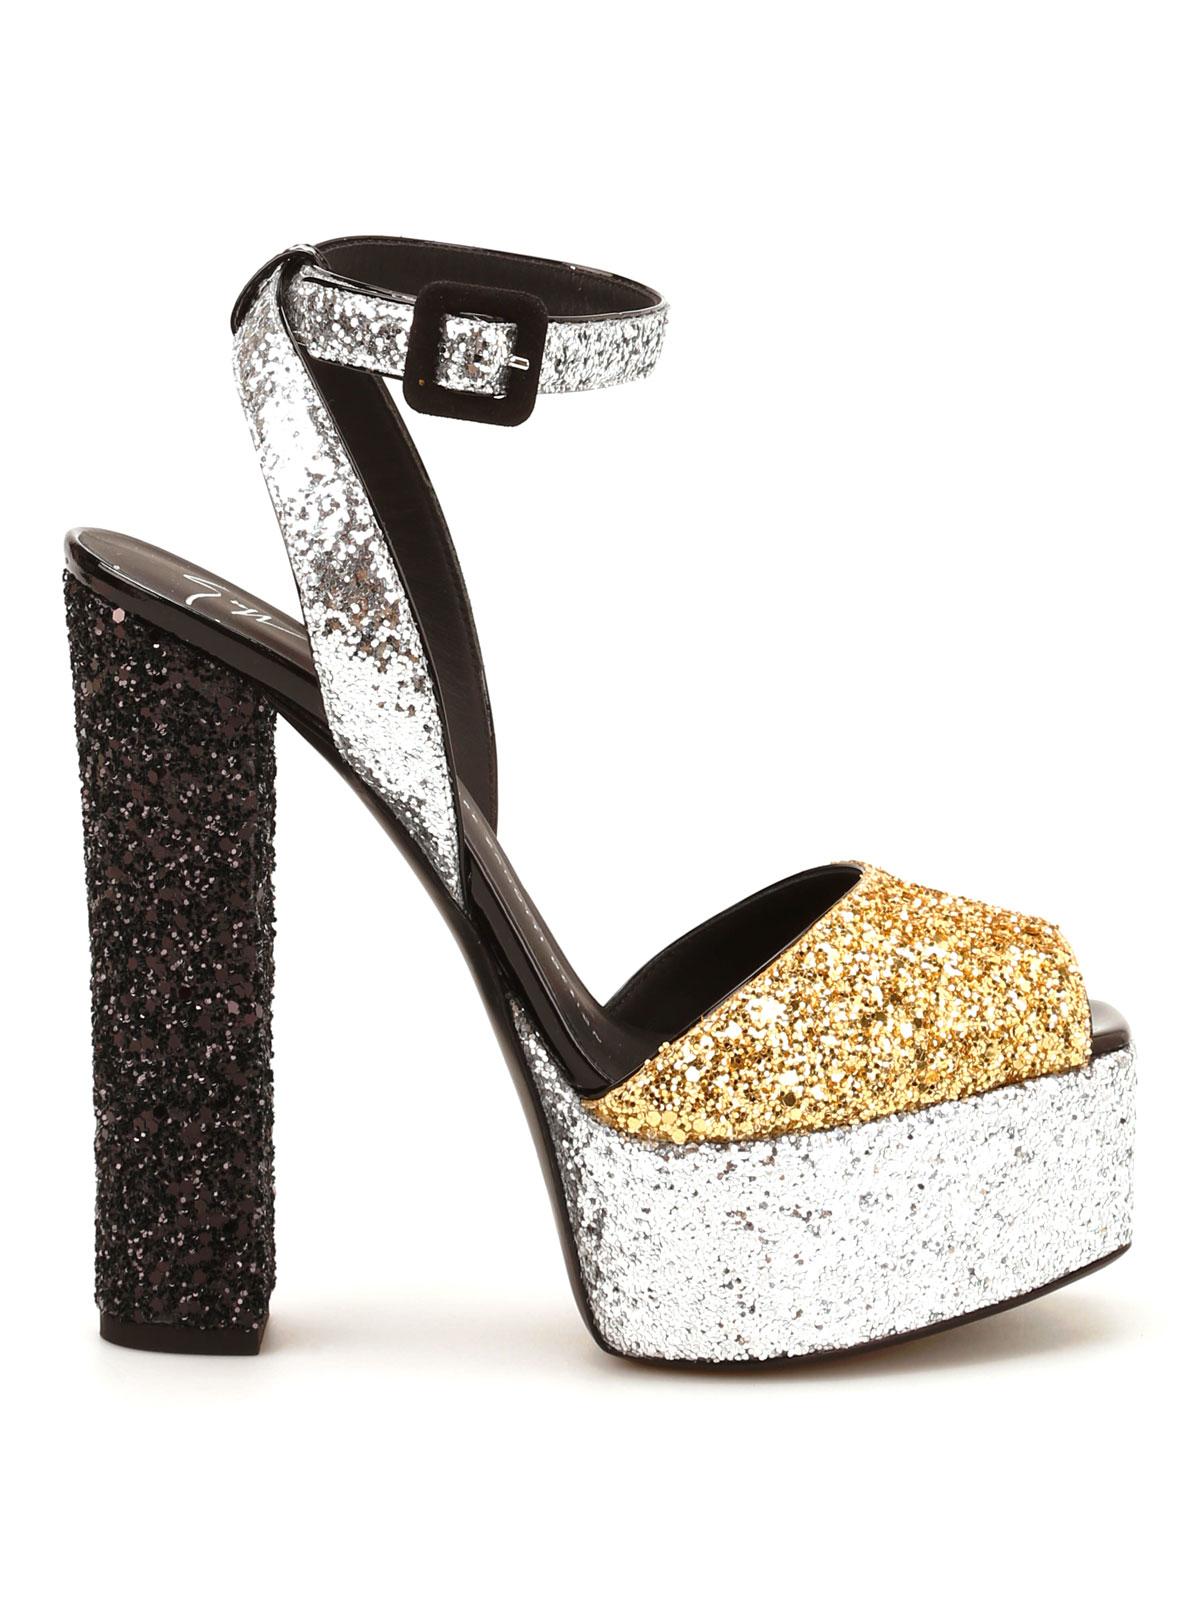 0441f6c6b048 Giuseppe Zanotti - Betty glittery platform sandals - sandals ...